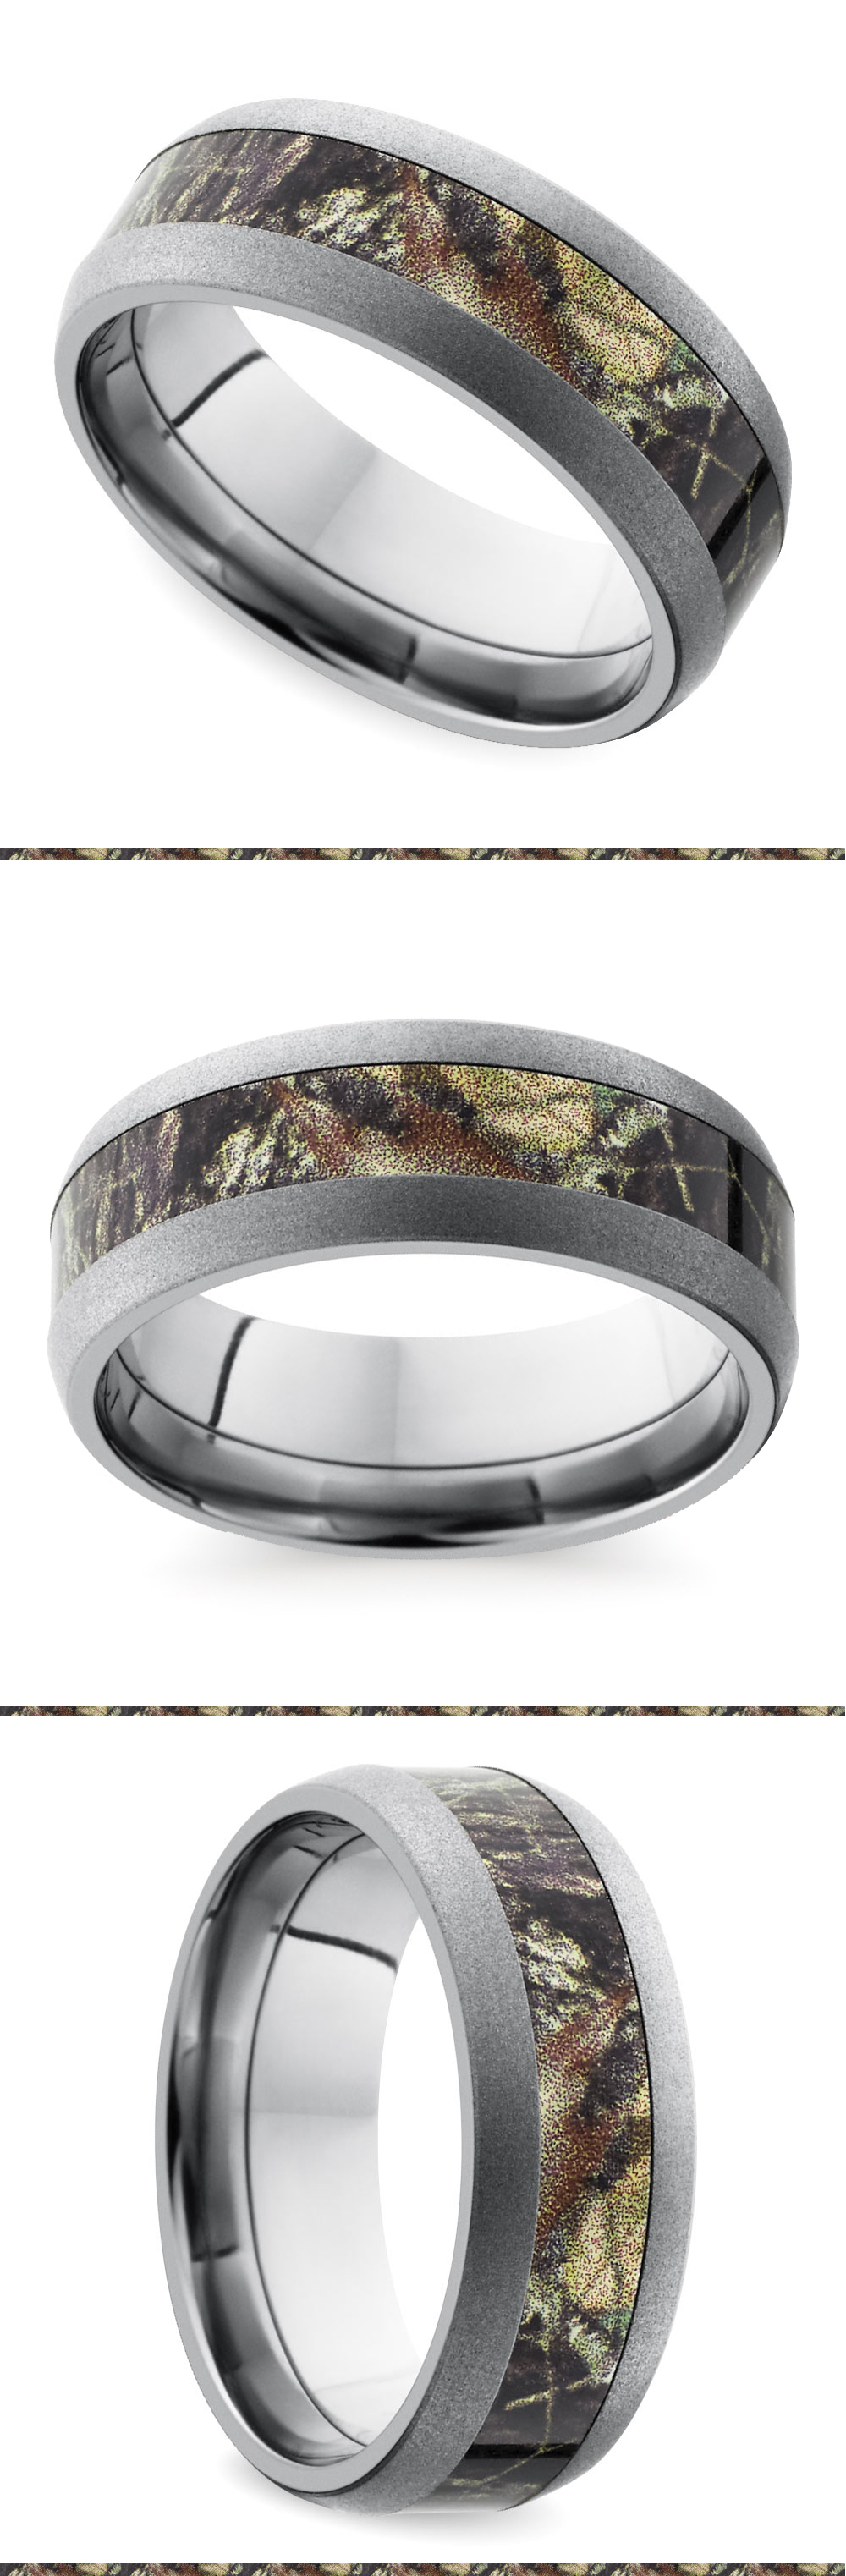 Beadblast Domed Camouflage Inlay Men's Wedding Ring in